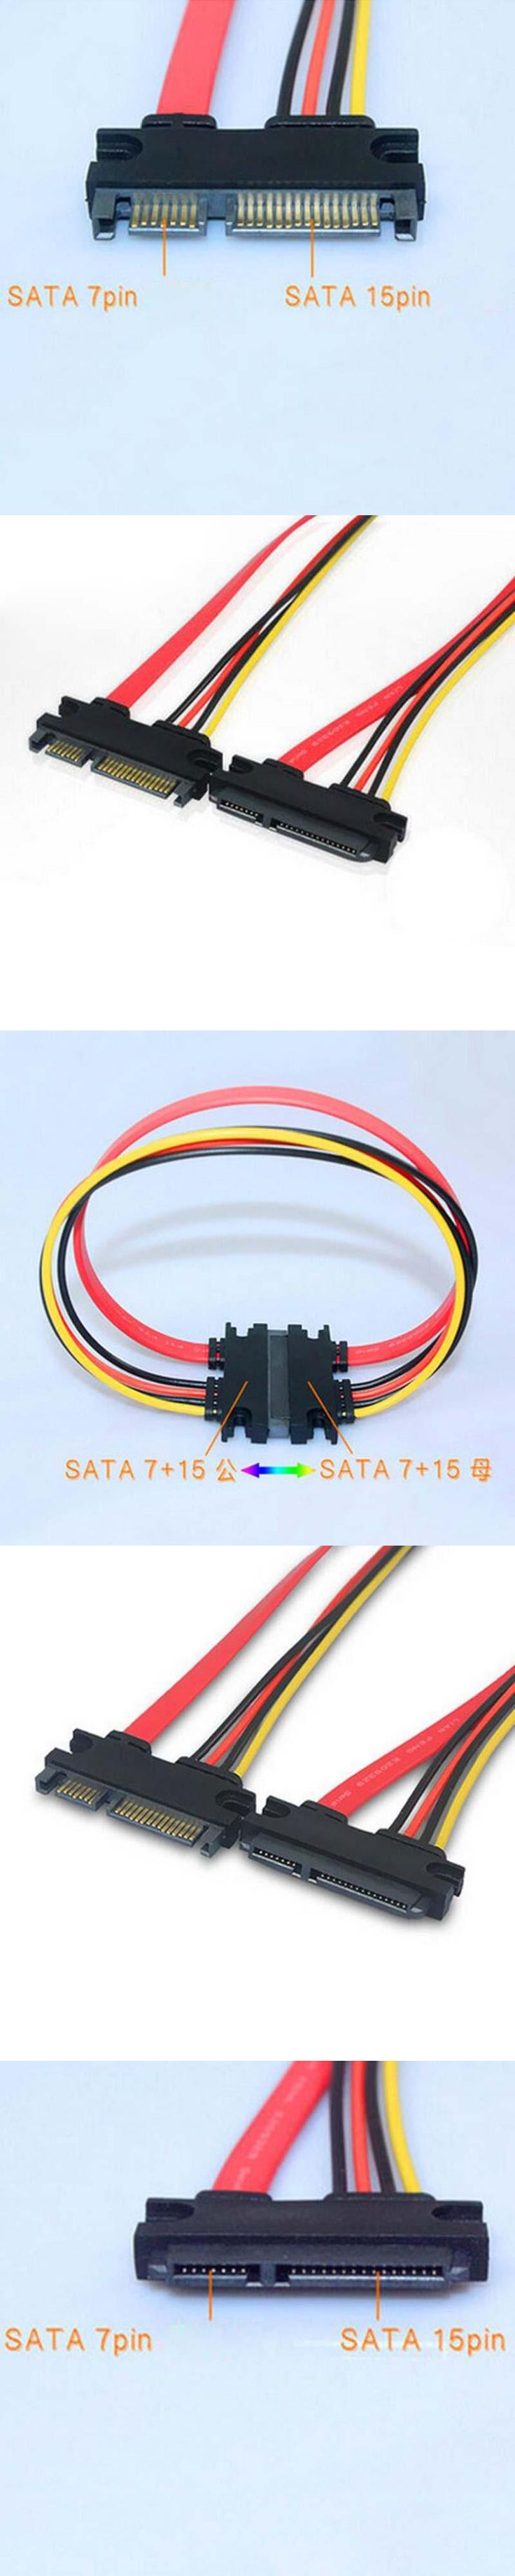 2pcs 7 + 15pin SATA Extension Cord Connector SATA Serial Port Extension Cable SATA + Power Extension Cable About 50 cm